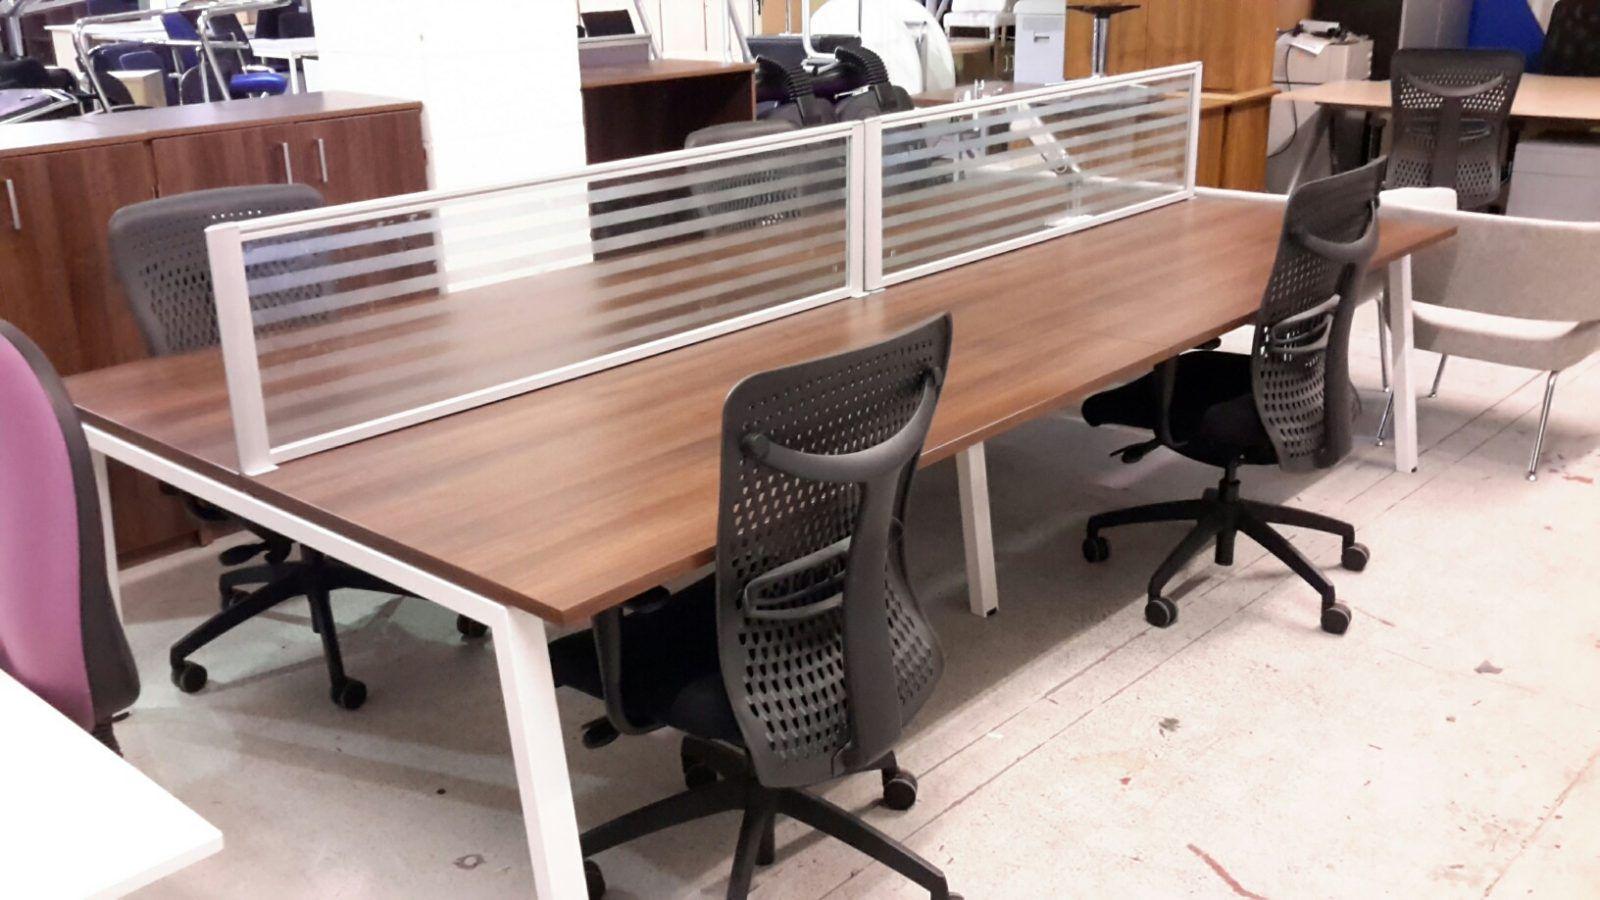 Büro Möbel Floyd Office Möbel | BüroMöbel | Pinterest | Büro möbel ...